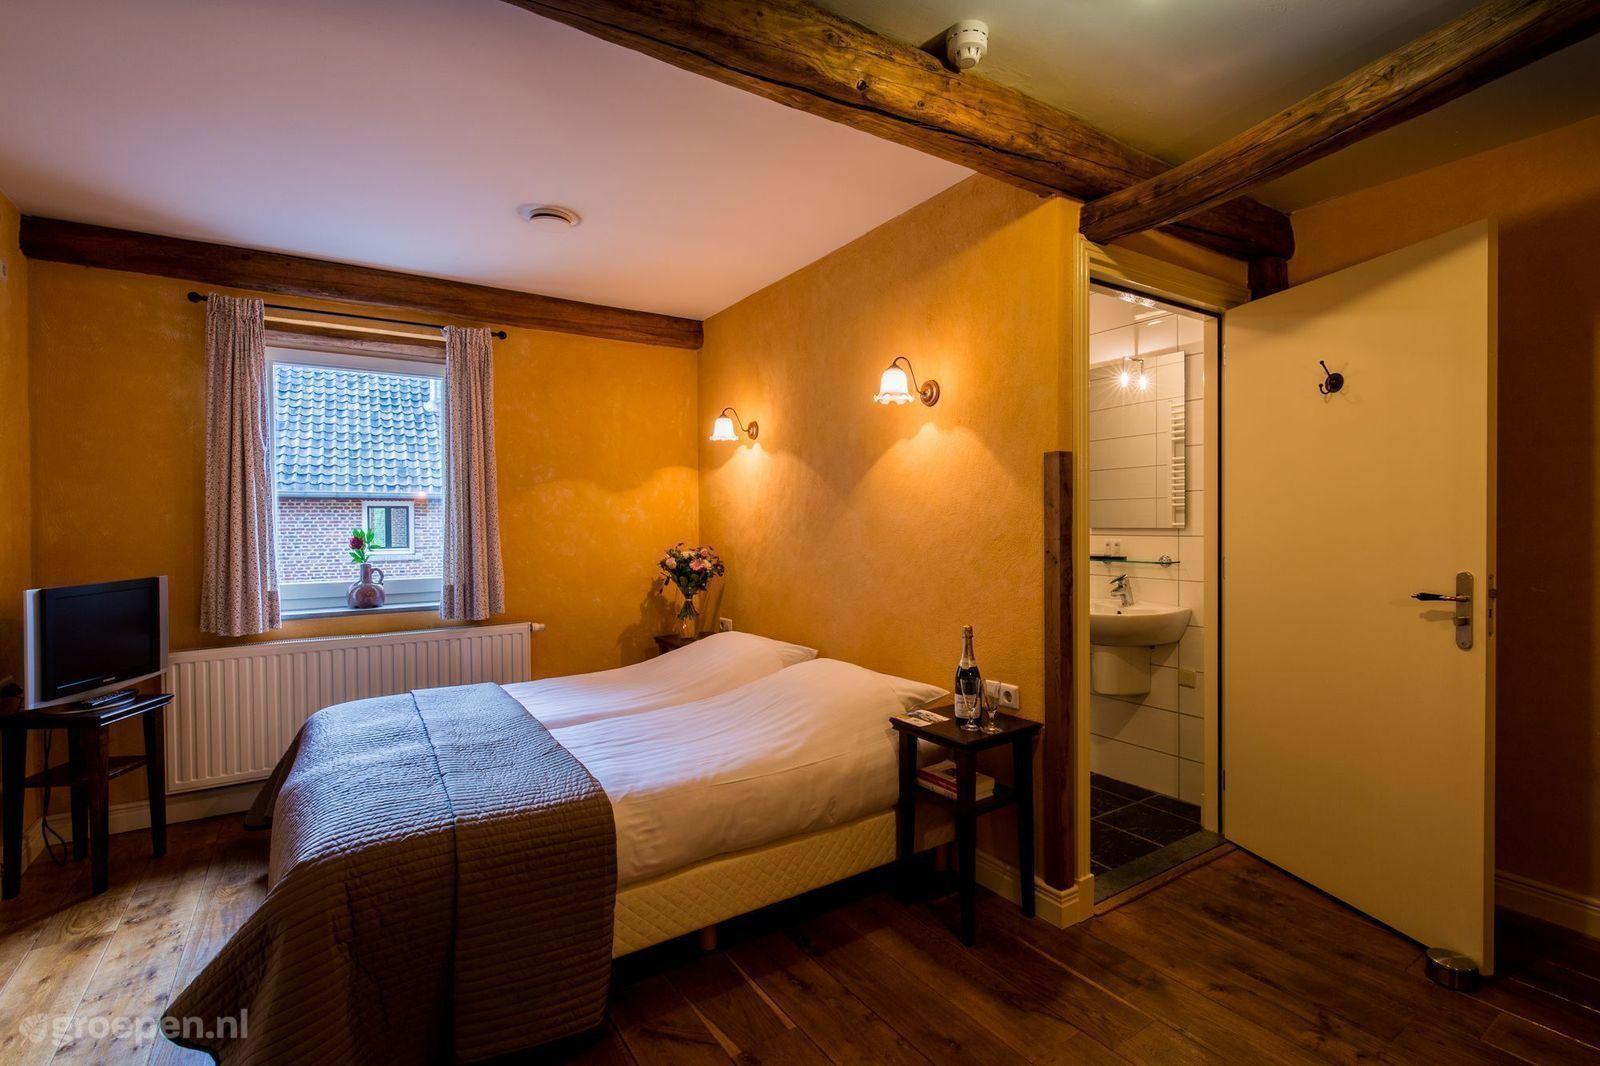 Group accommodation Slenaken-Heijenrath